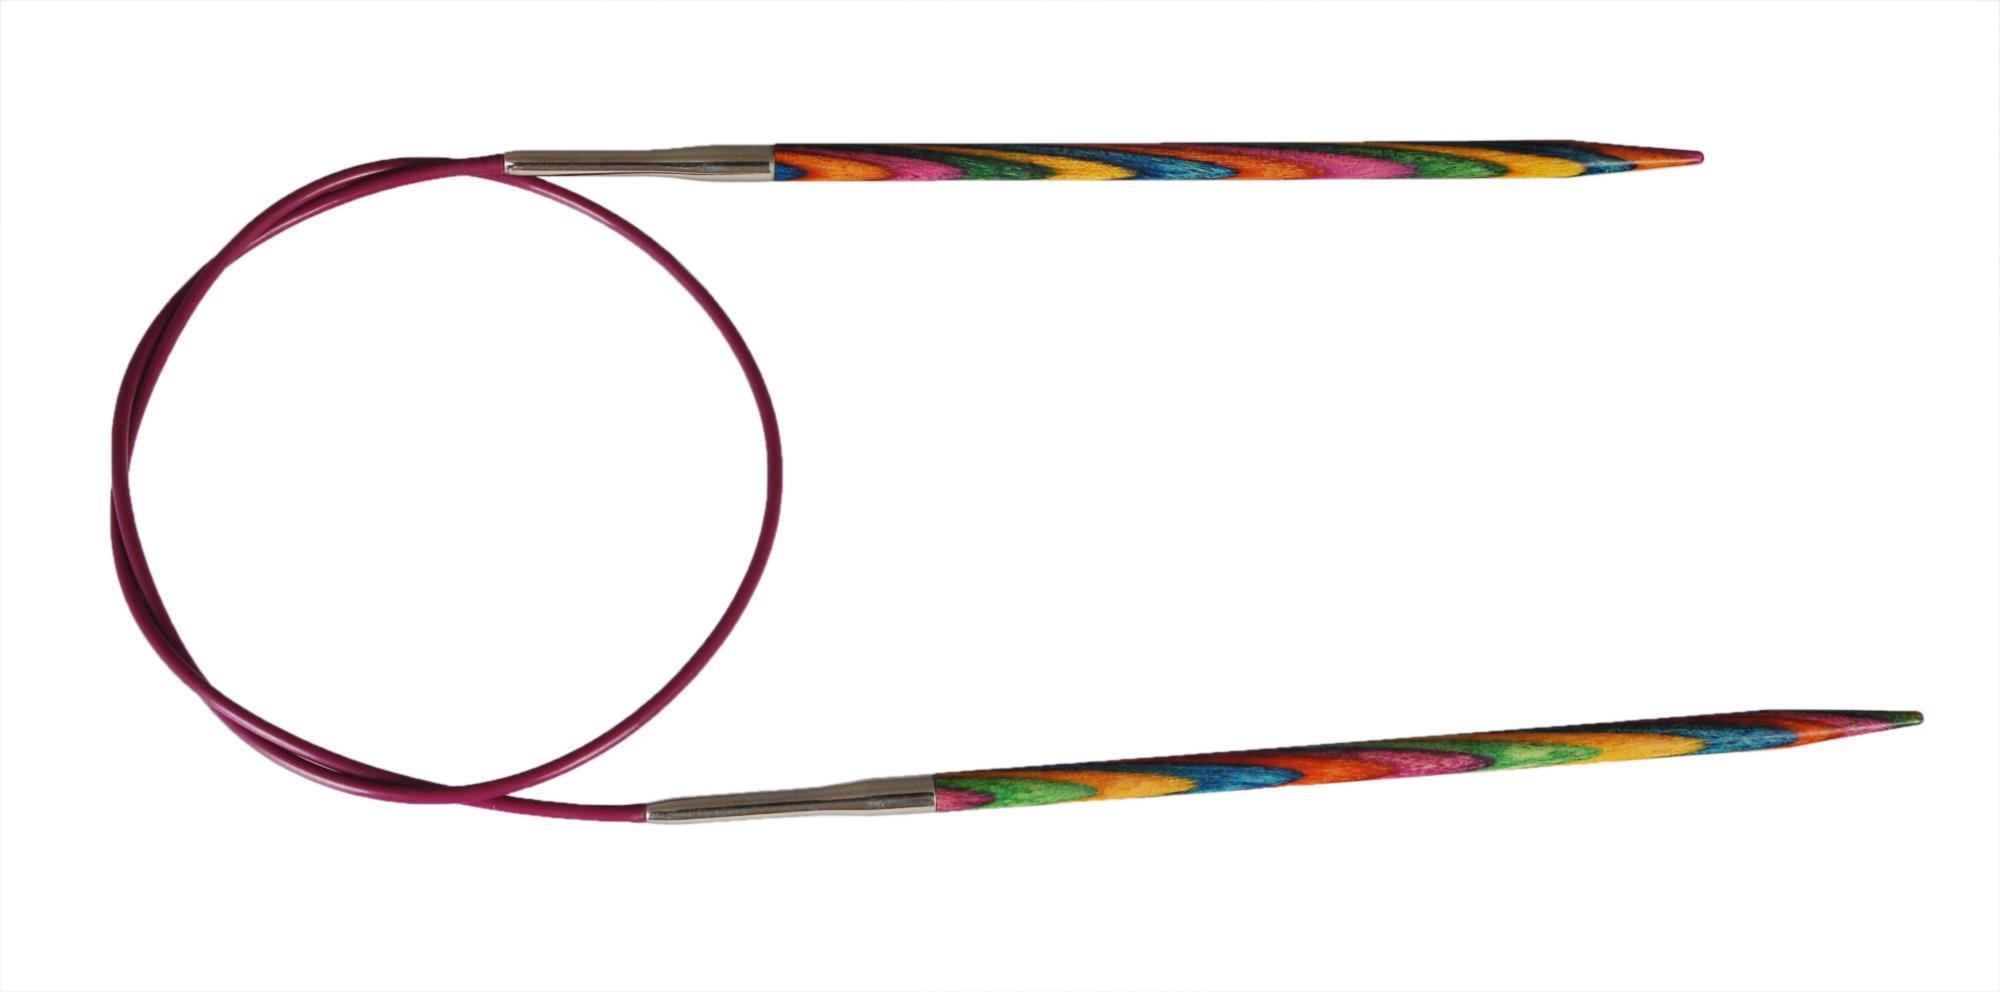 Спицы круговые 100 см Symfonie Wood KnitPro, 21361, 10.00 мм